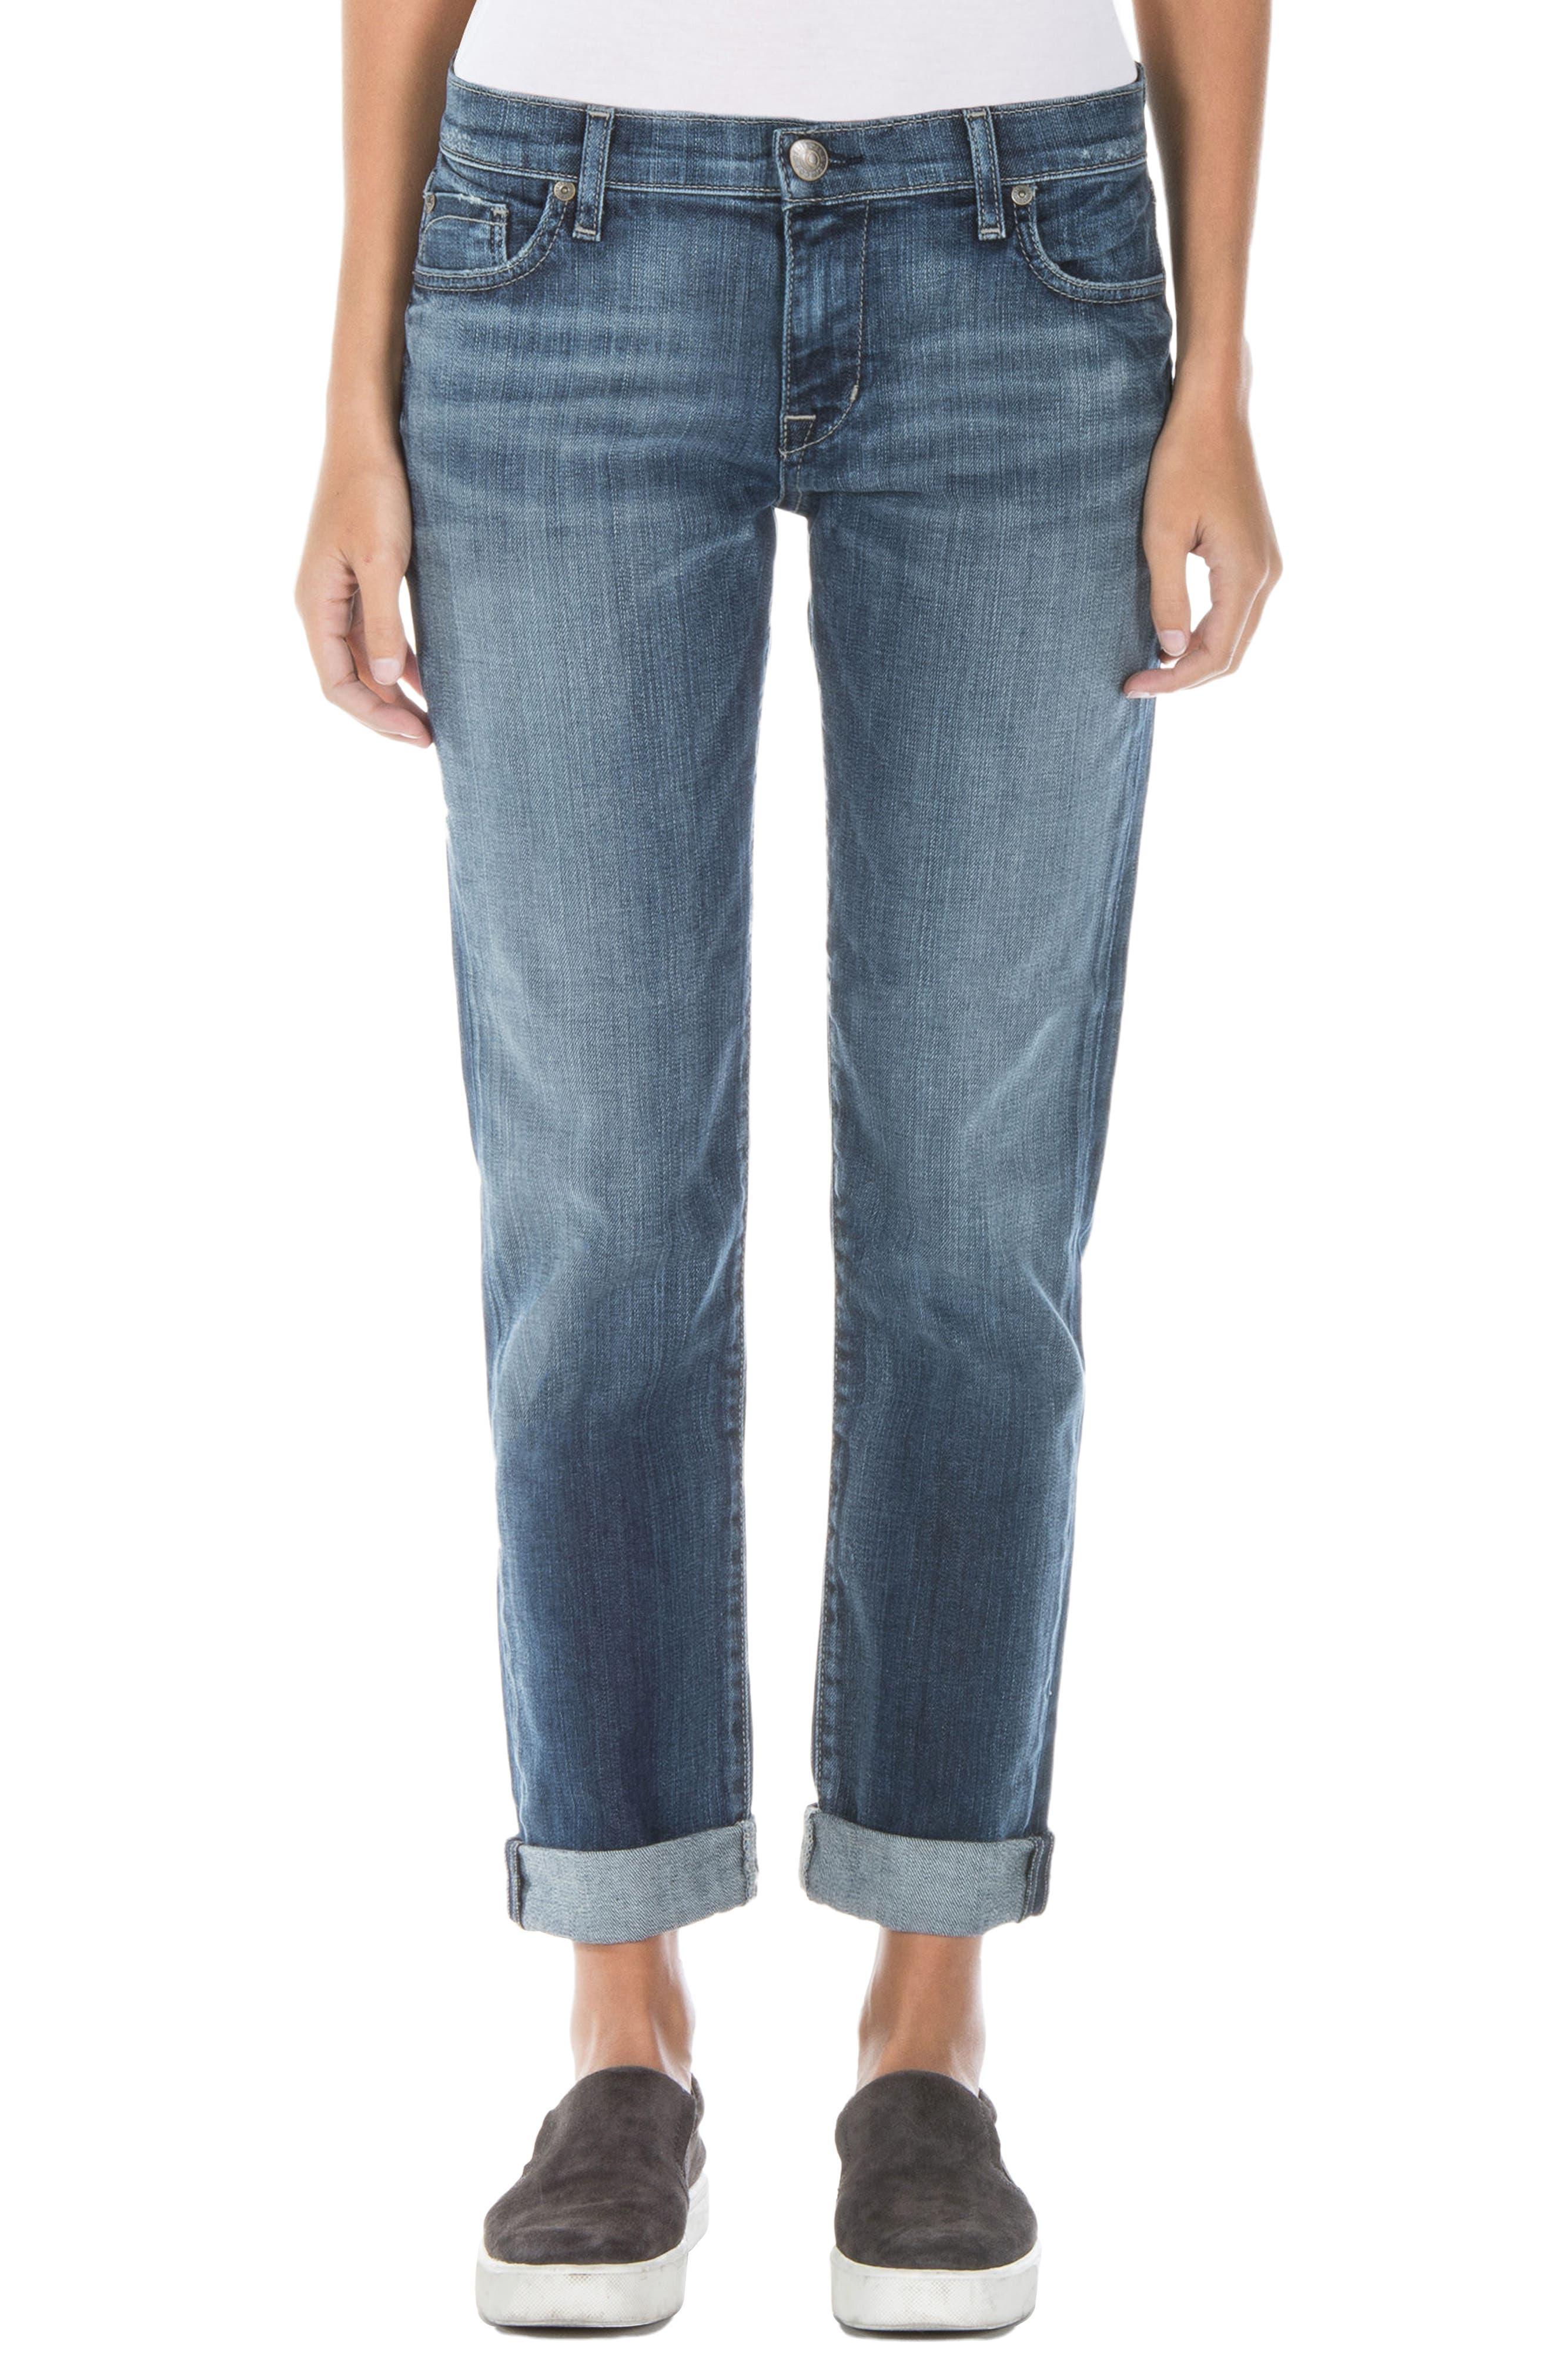 Alternate Image 1 Selected - Fidelity Denim Axl Girlfriend Jeans (Exile Vintage)